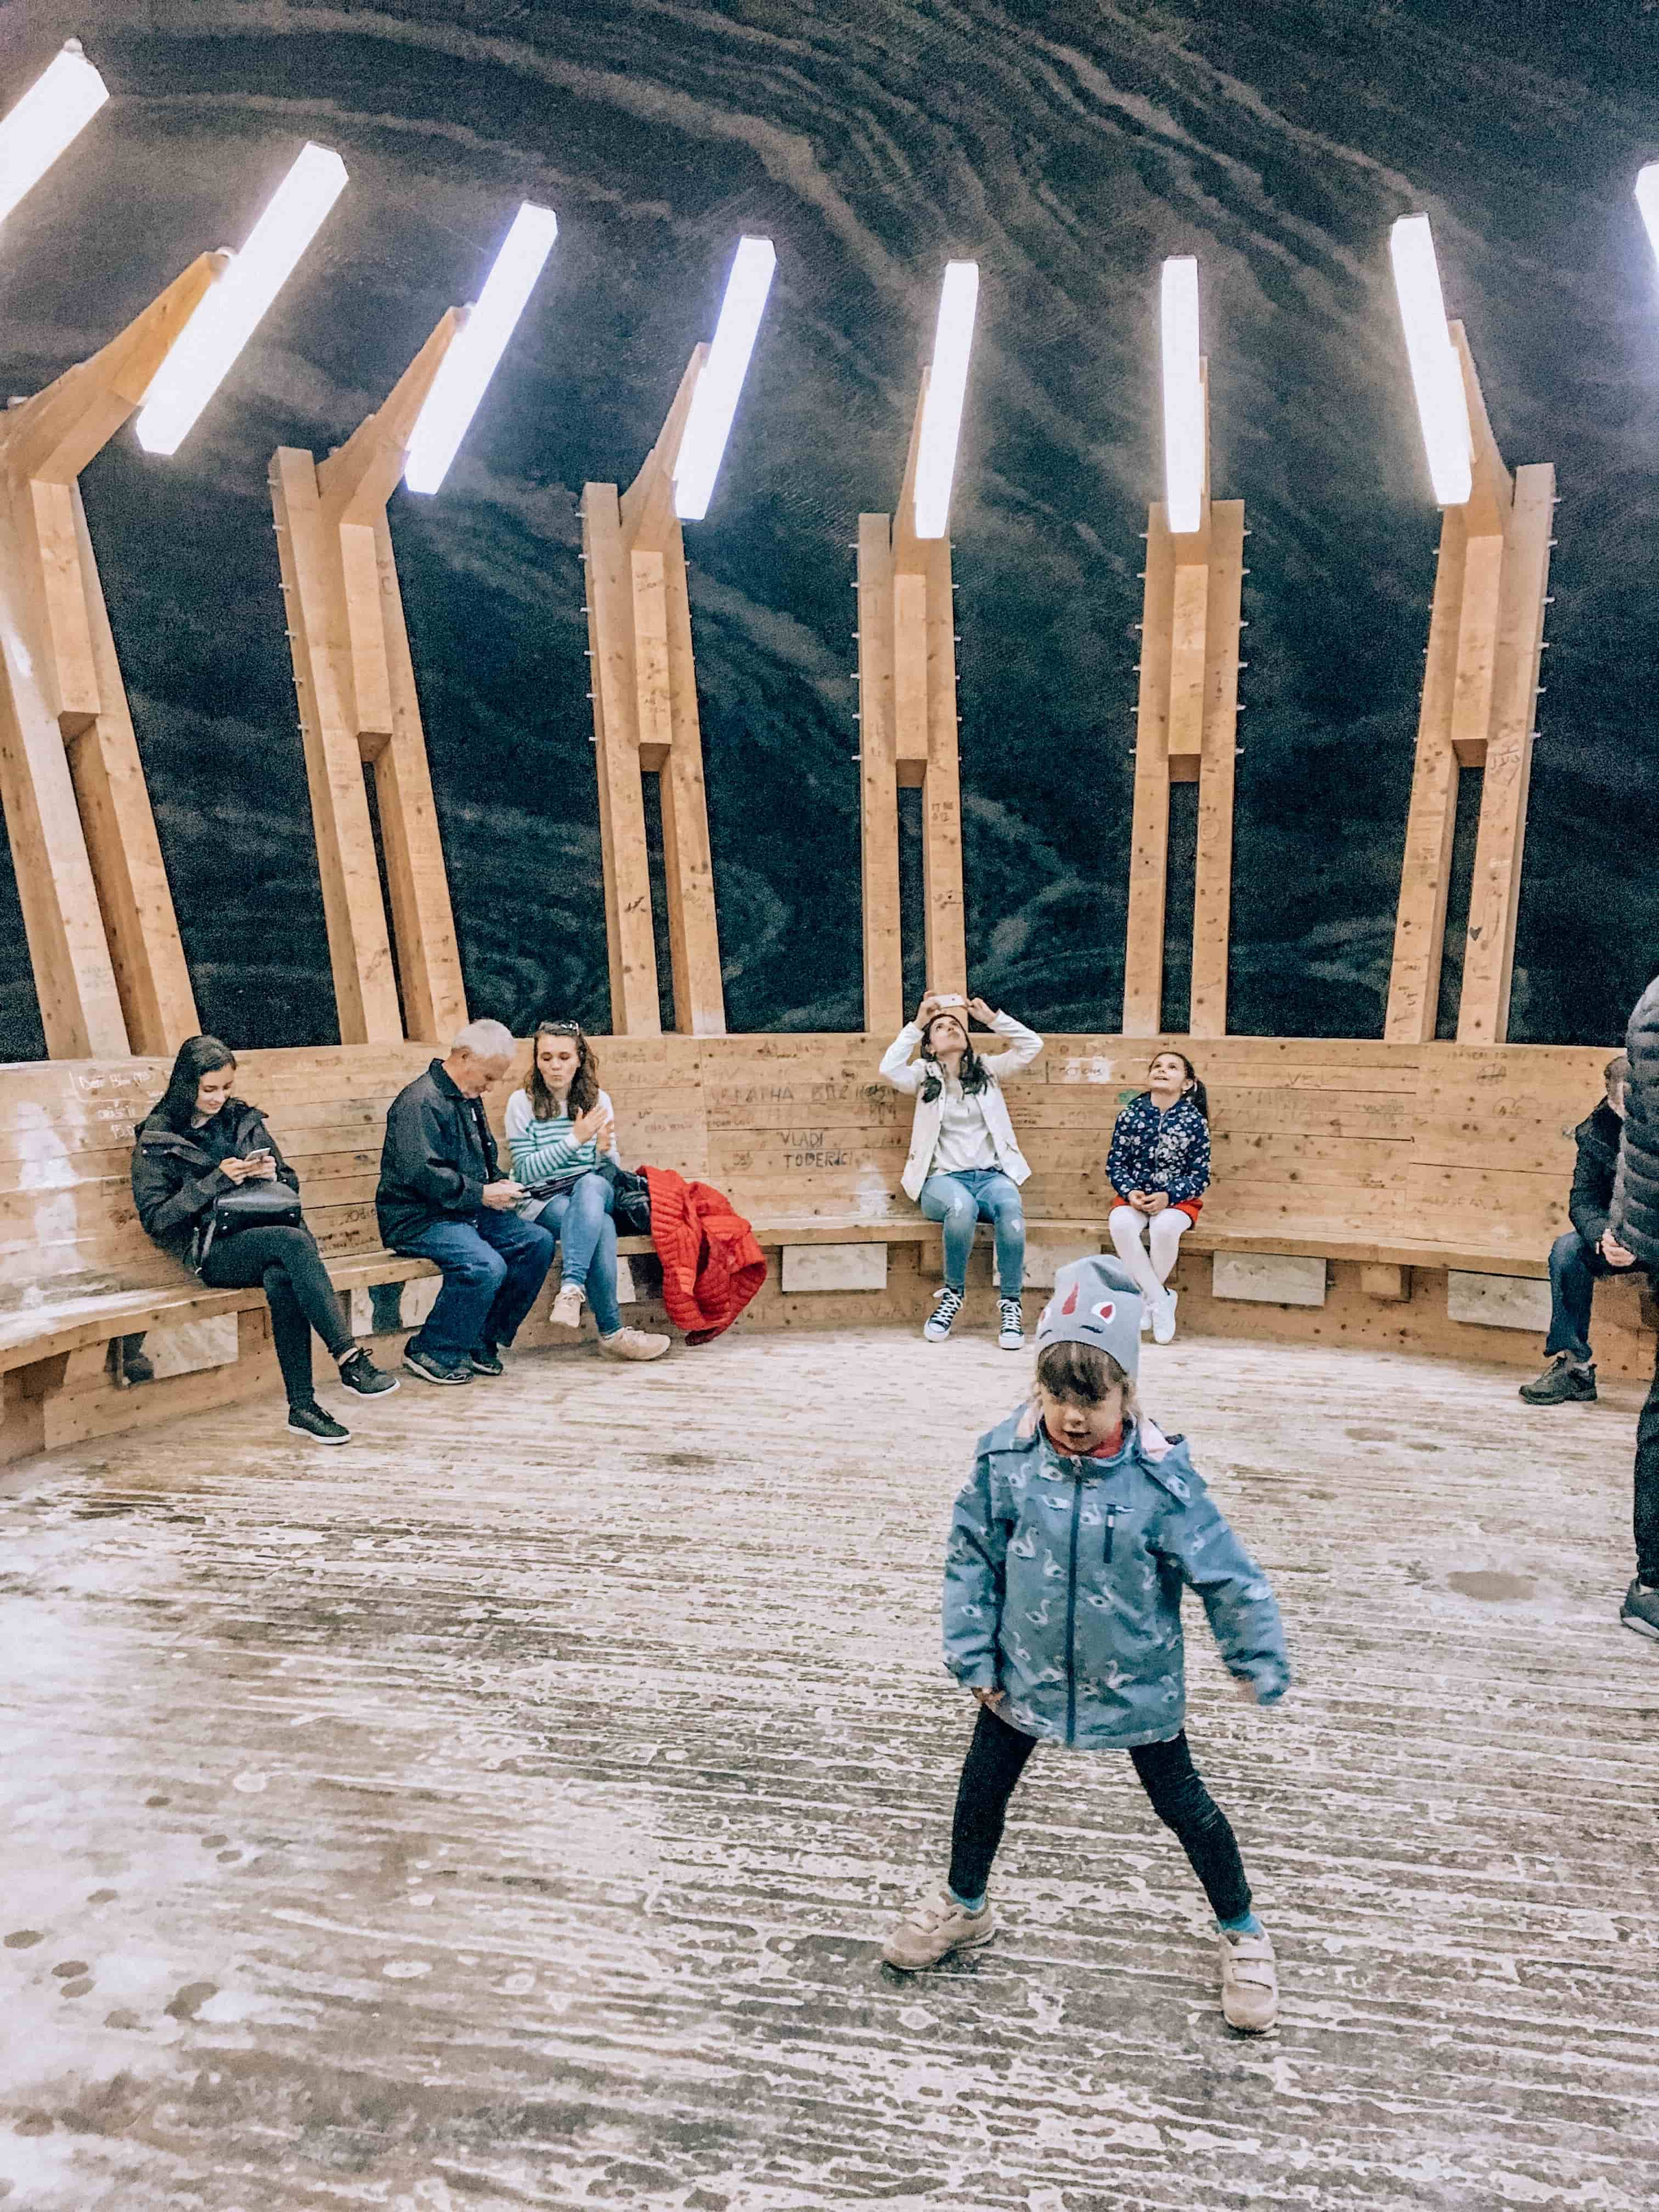 Салина Турда | Salina Turda | Соляная шахта в городе Турда